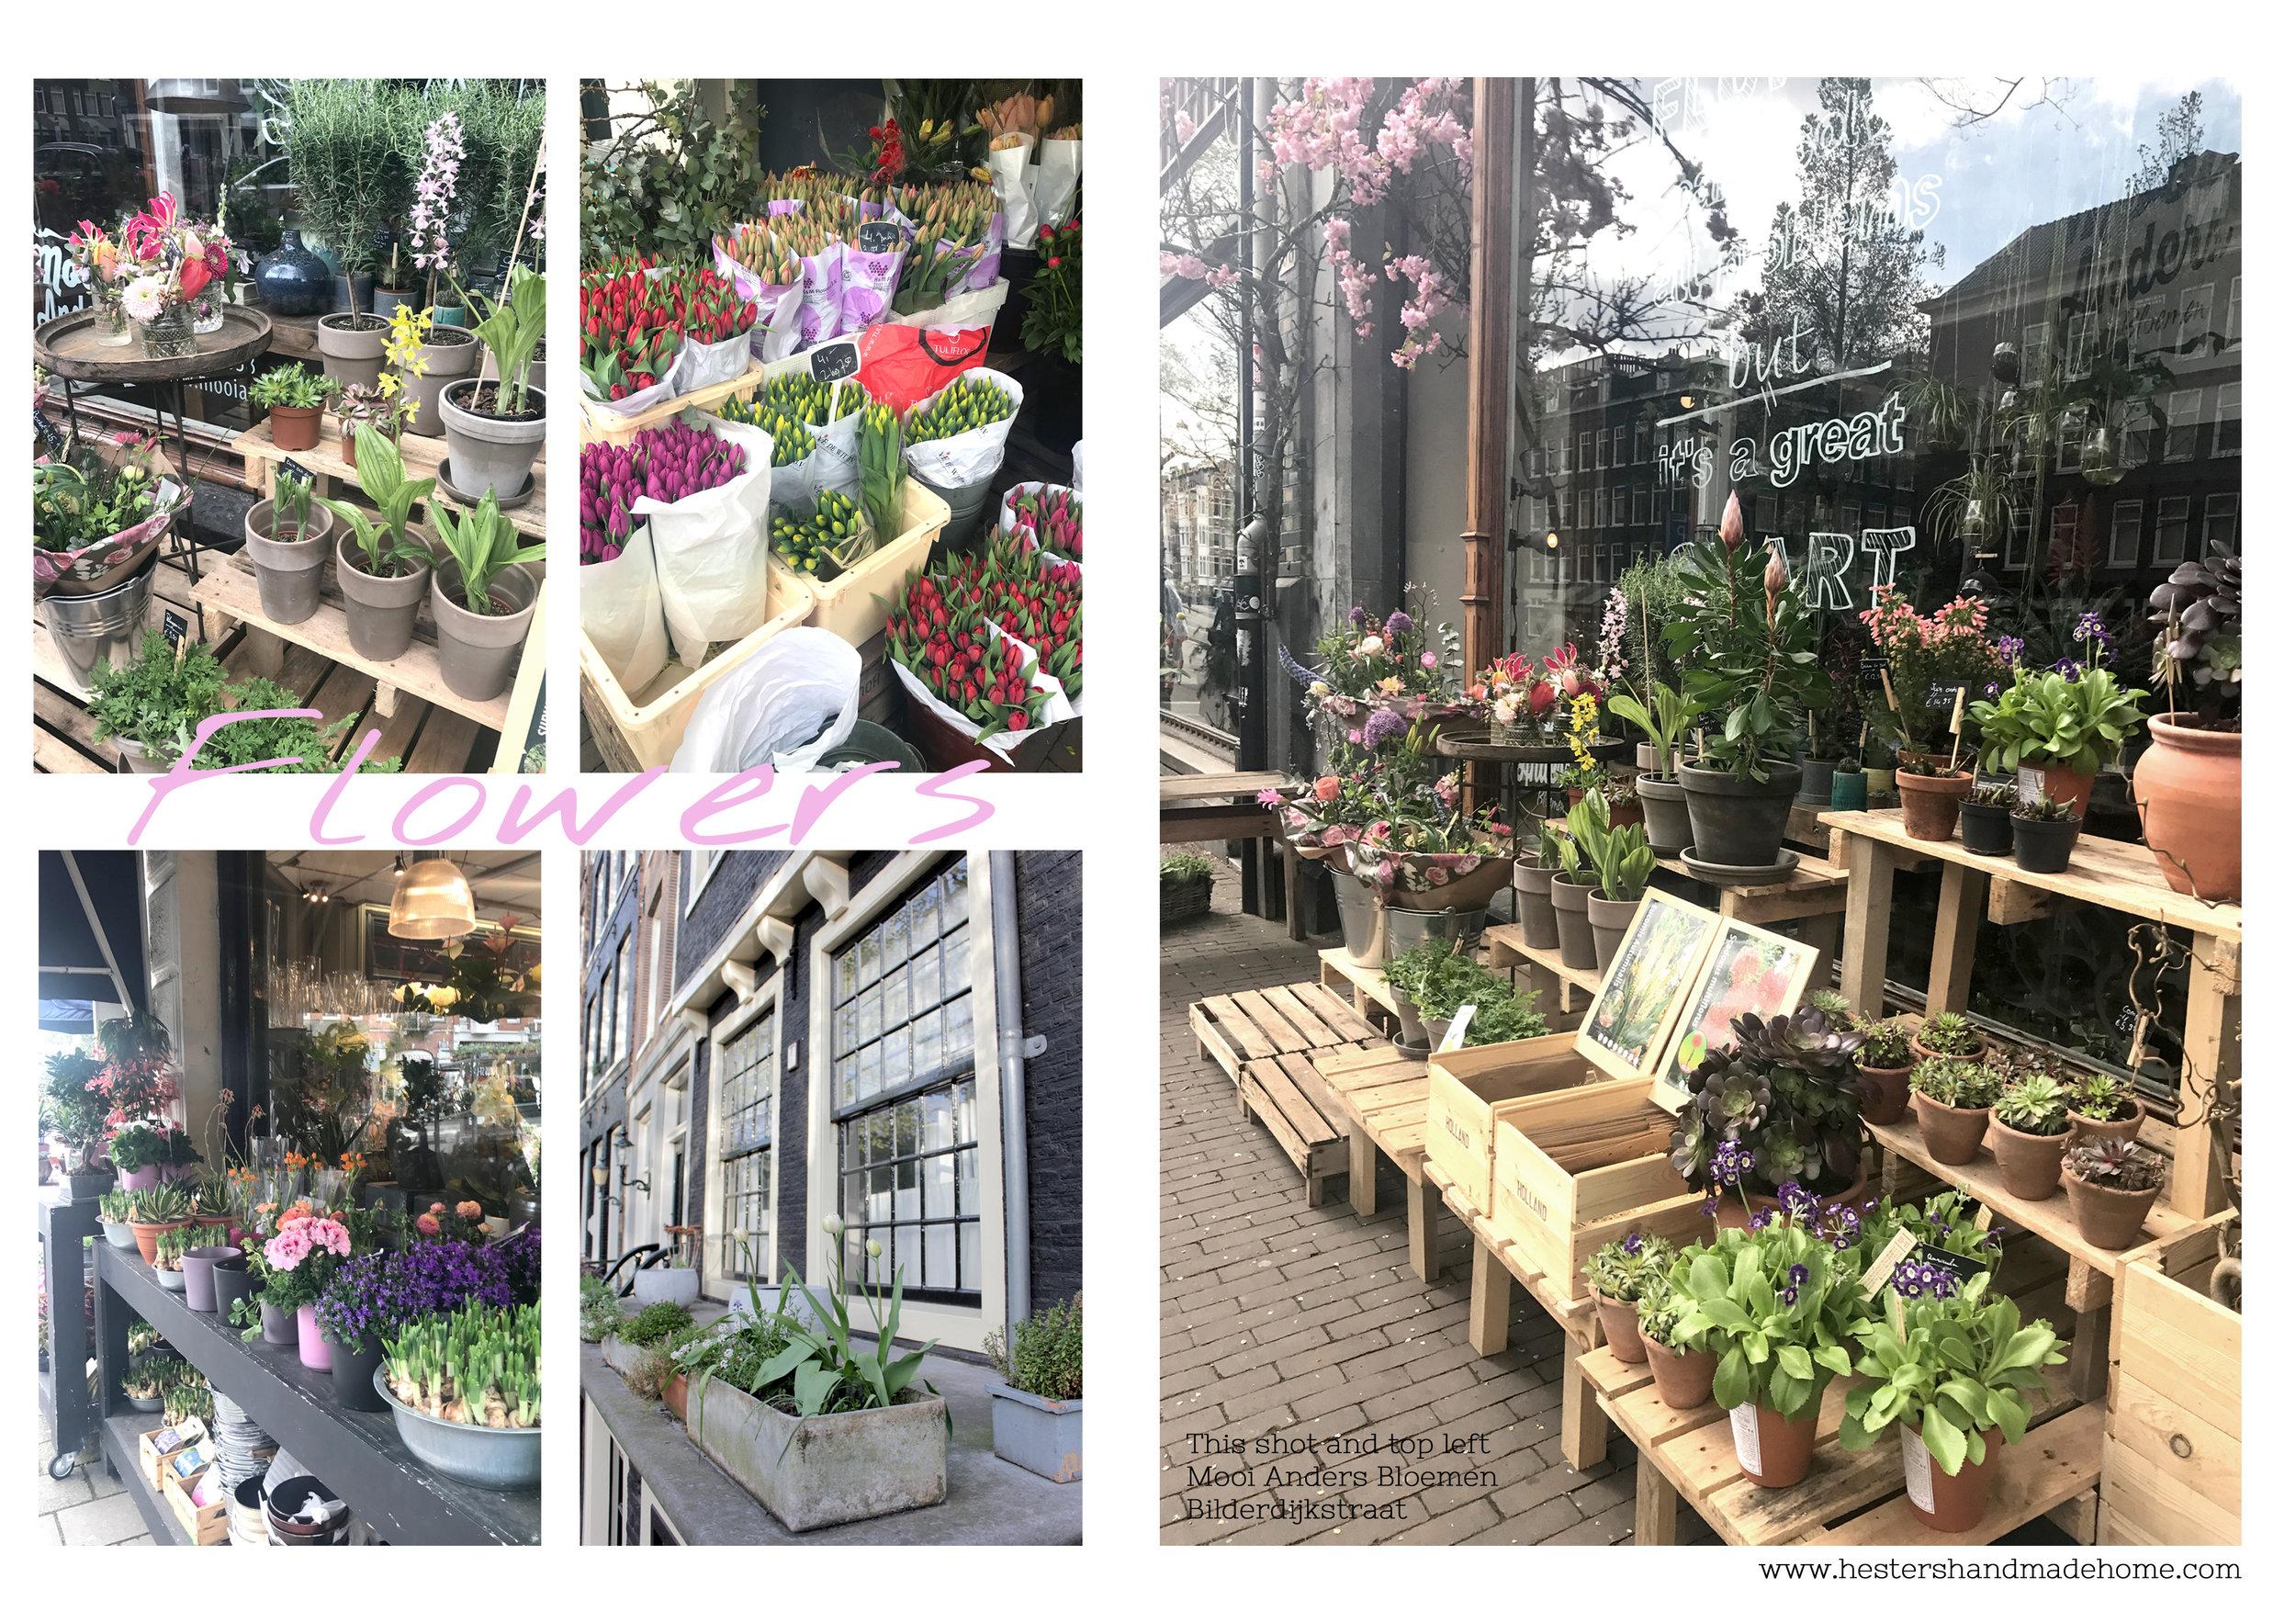 flowers Amsterdam city guide Hesters Handmade Home